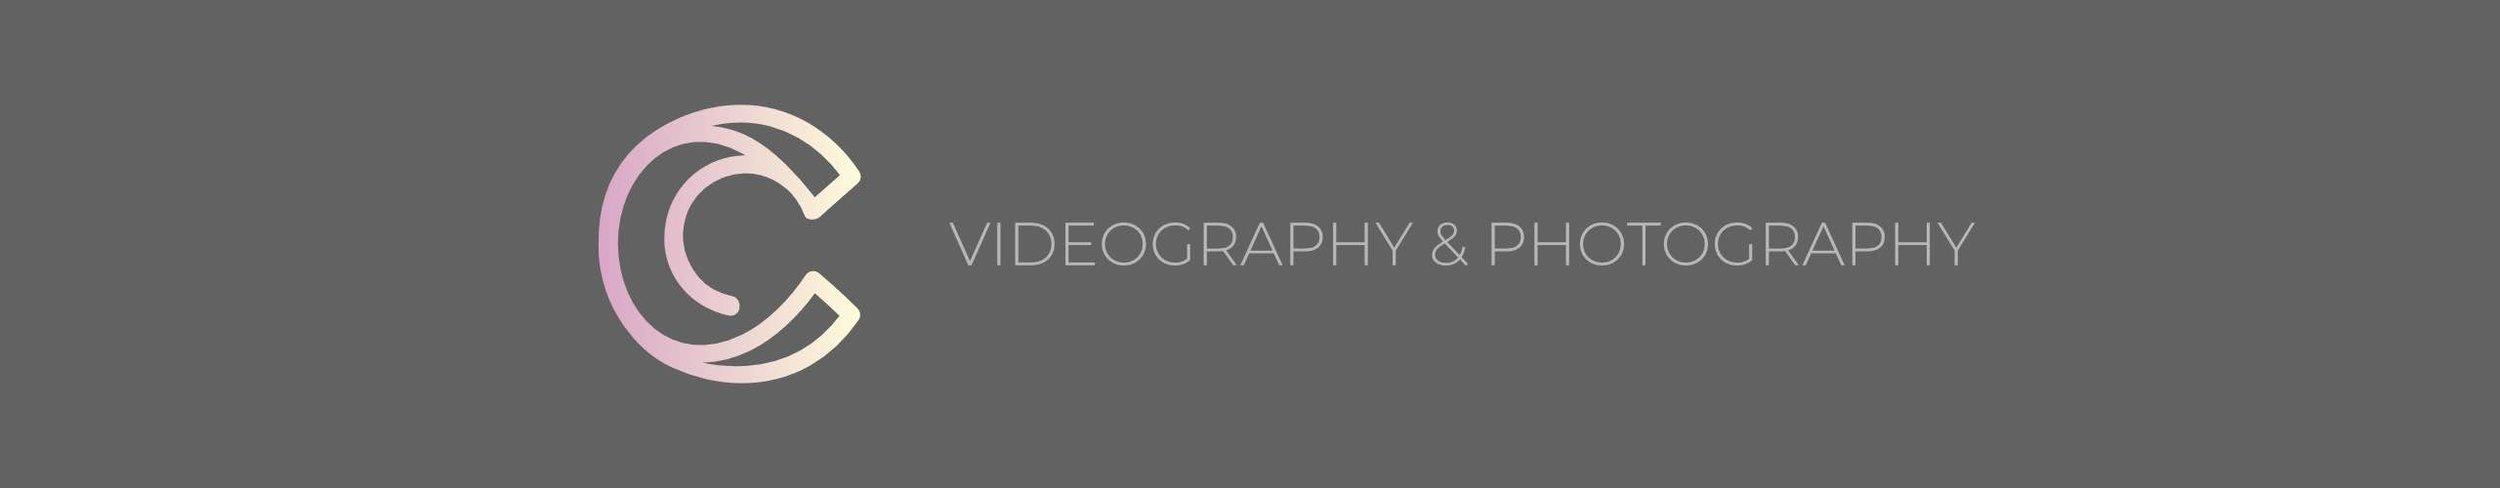 the-creative-co-video-photo-banner.jpg